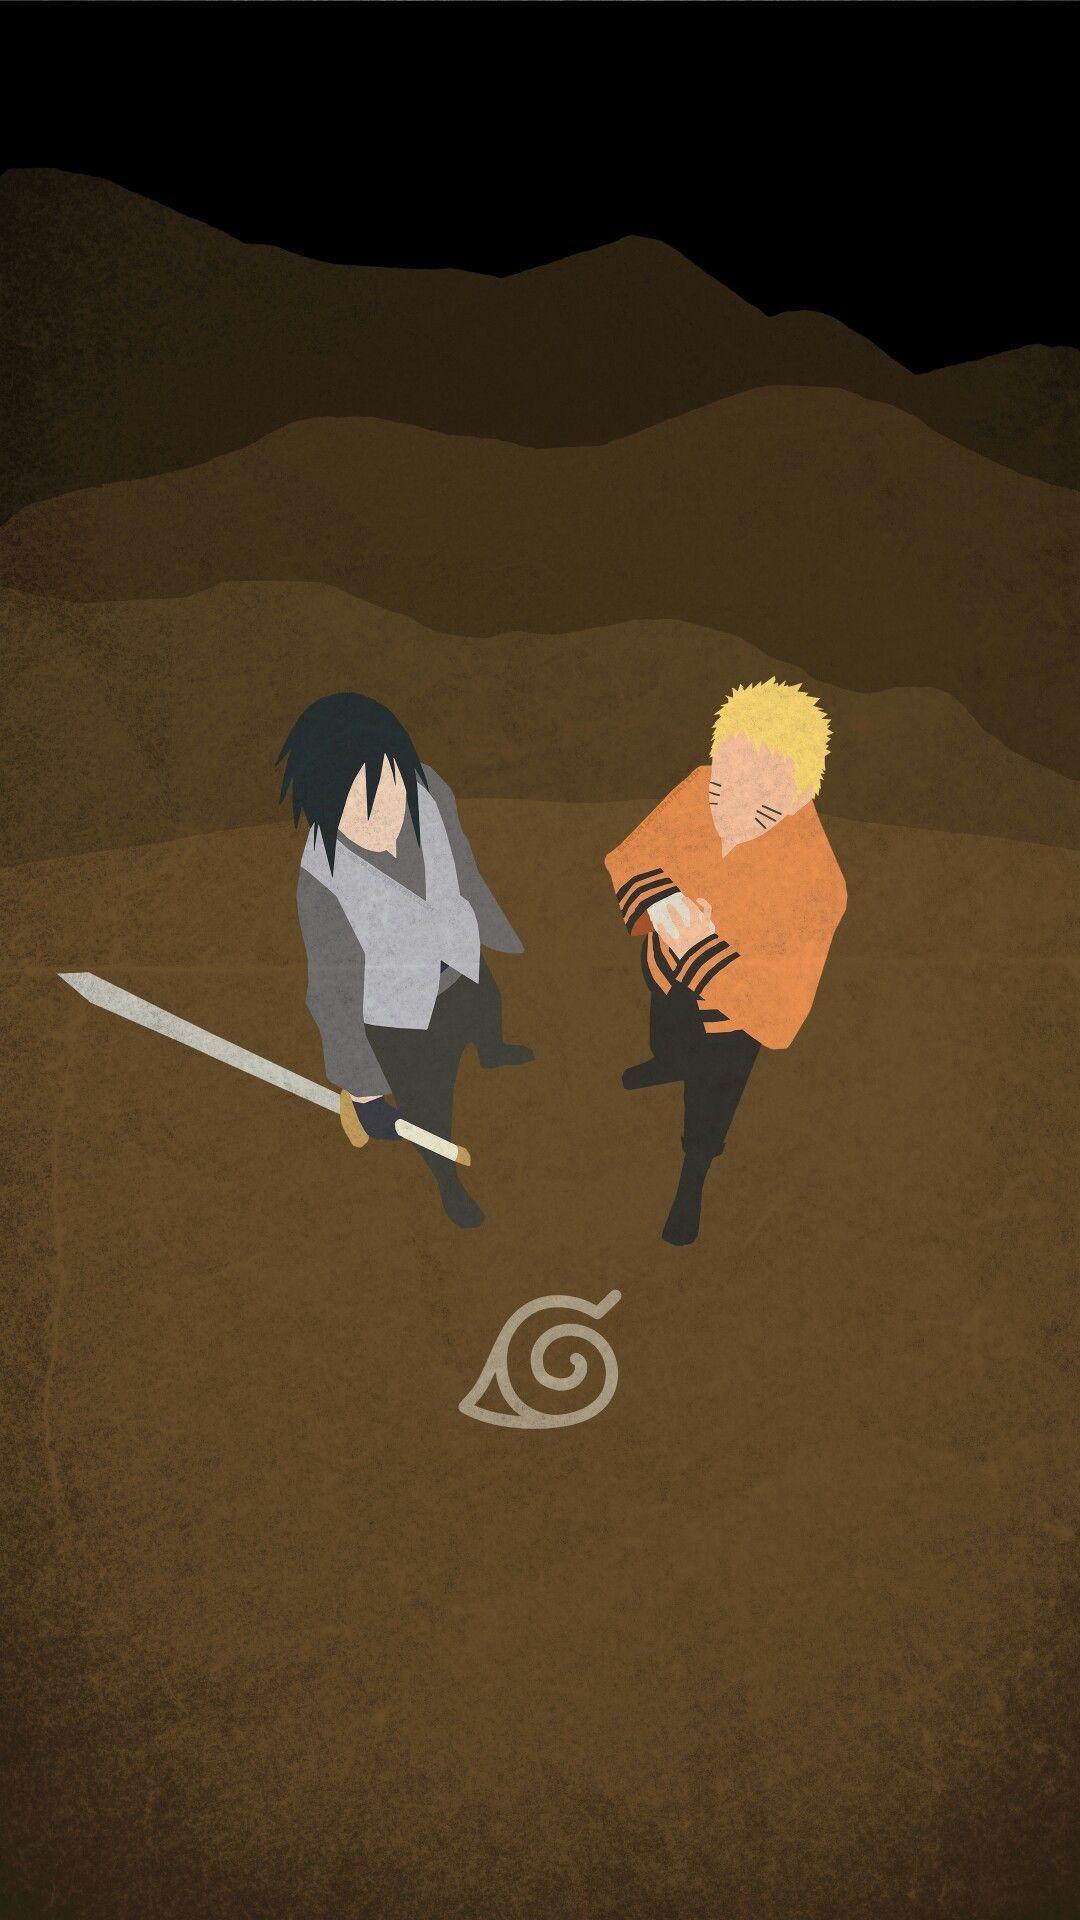 Naruto Minimalist Wallpapers Top Free Naruto Minimalist Backgrounds Wallpaperaccess